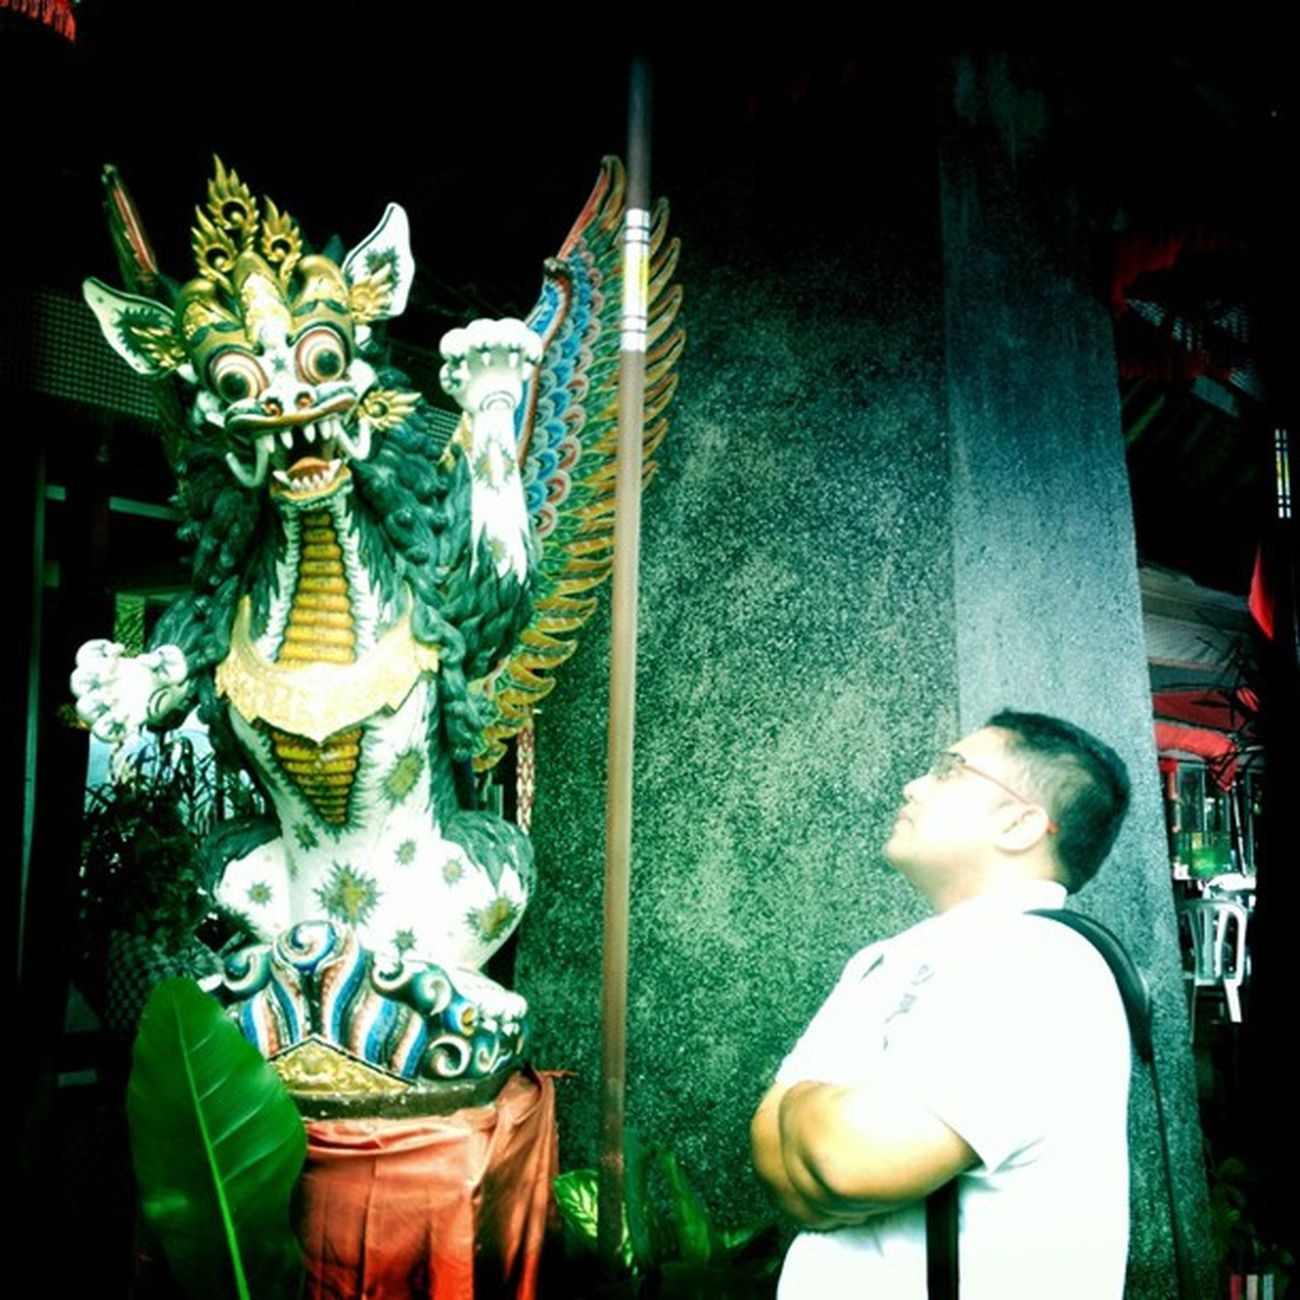 My Indonesia Iphonesia Iphonesialeague1130 Cetagram Instago Hipstamatic Johns Blankofreedom13 Tastypop